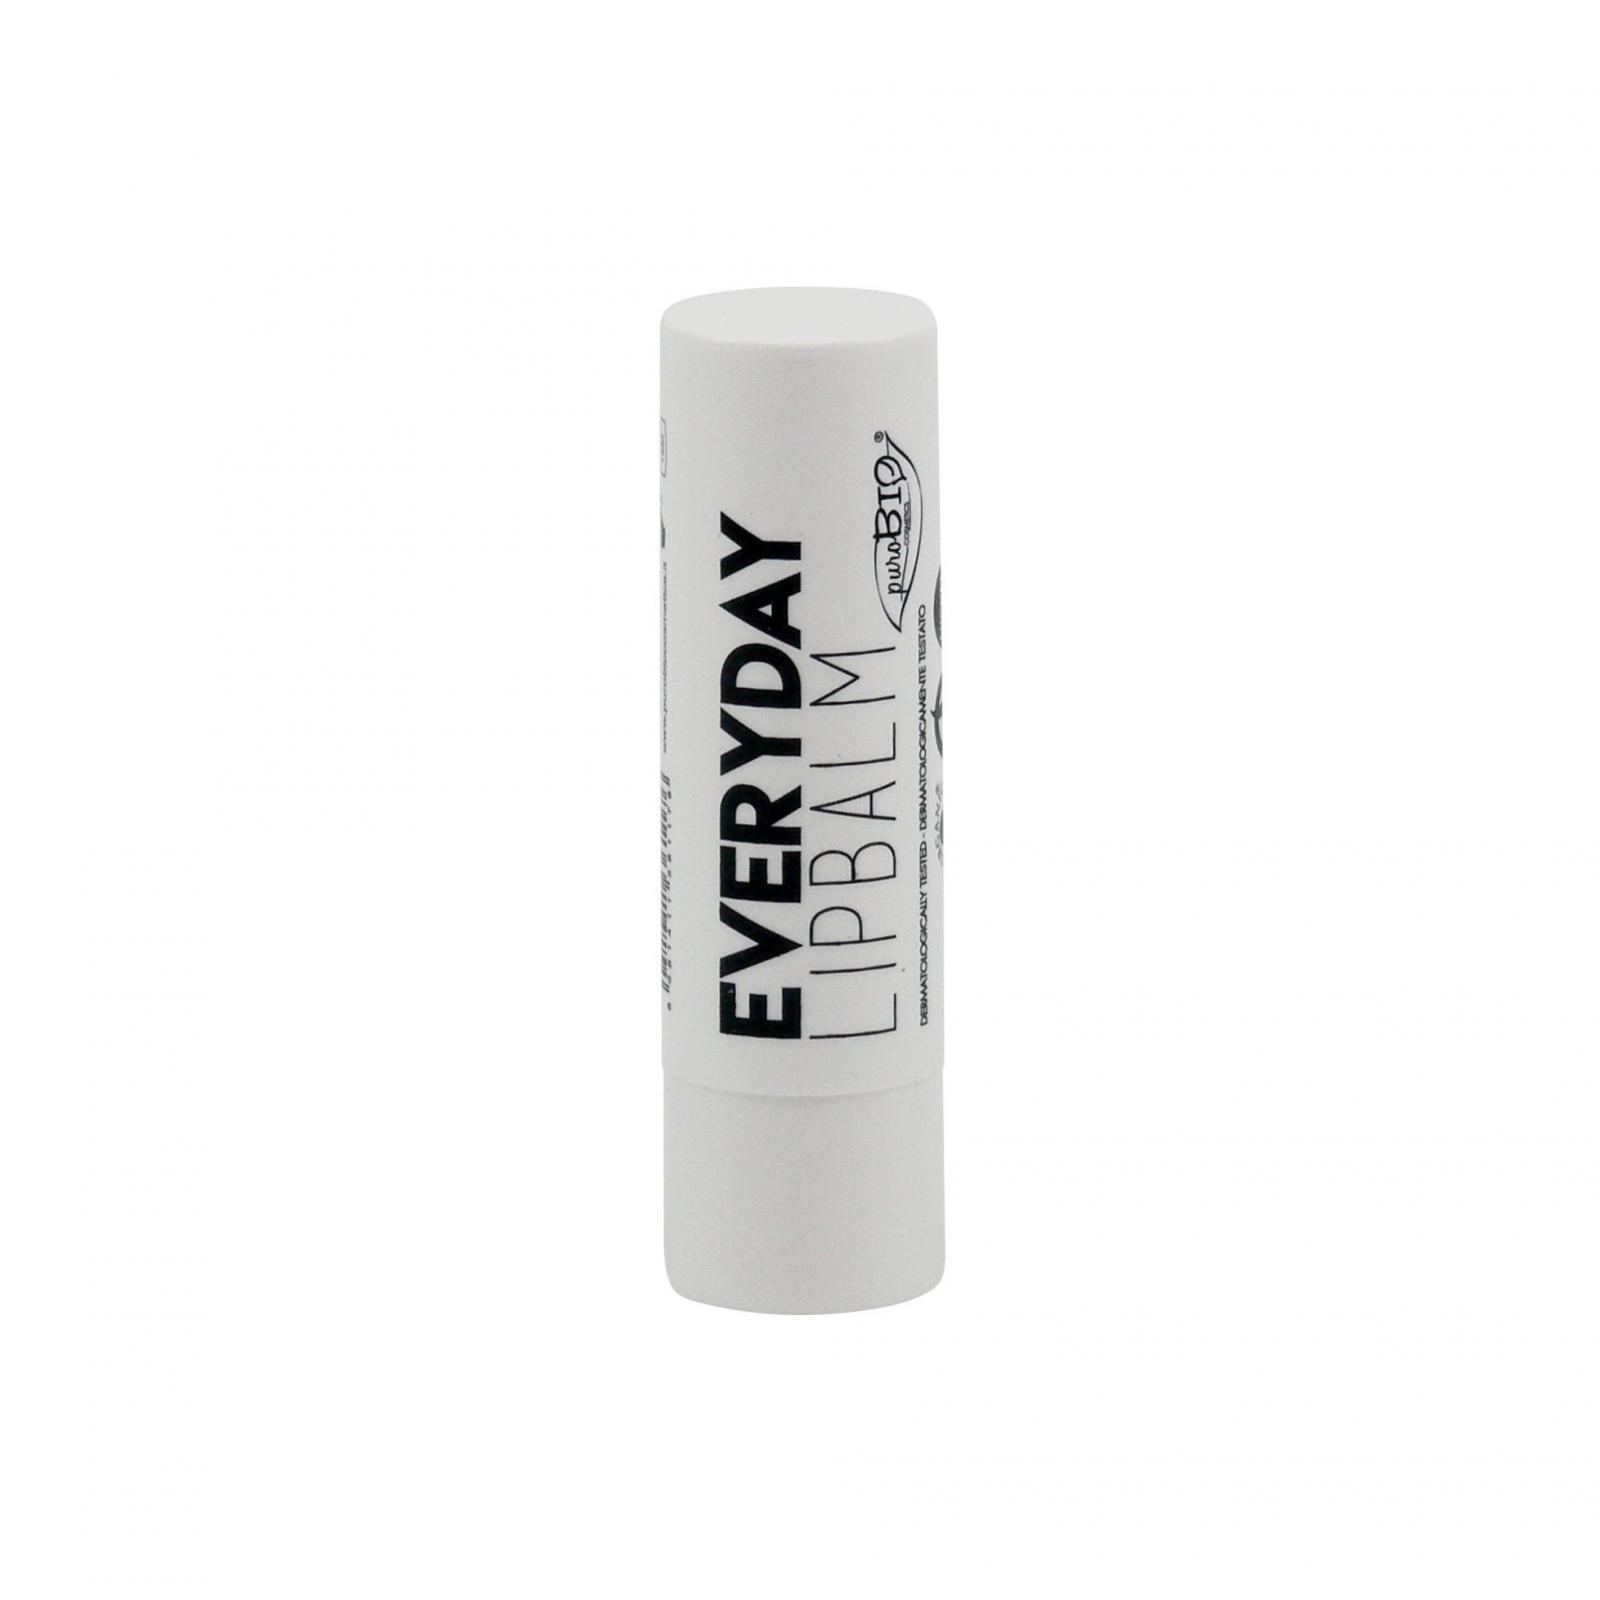 puroBIO cosmetics Balzám na rty pro každý den 5 ml